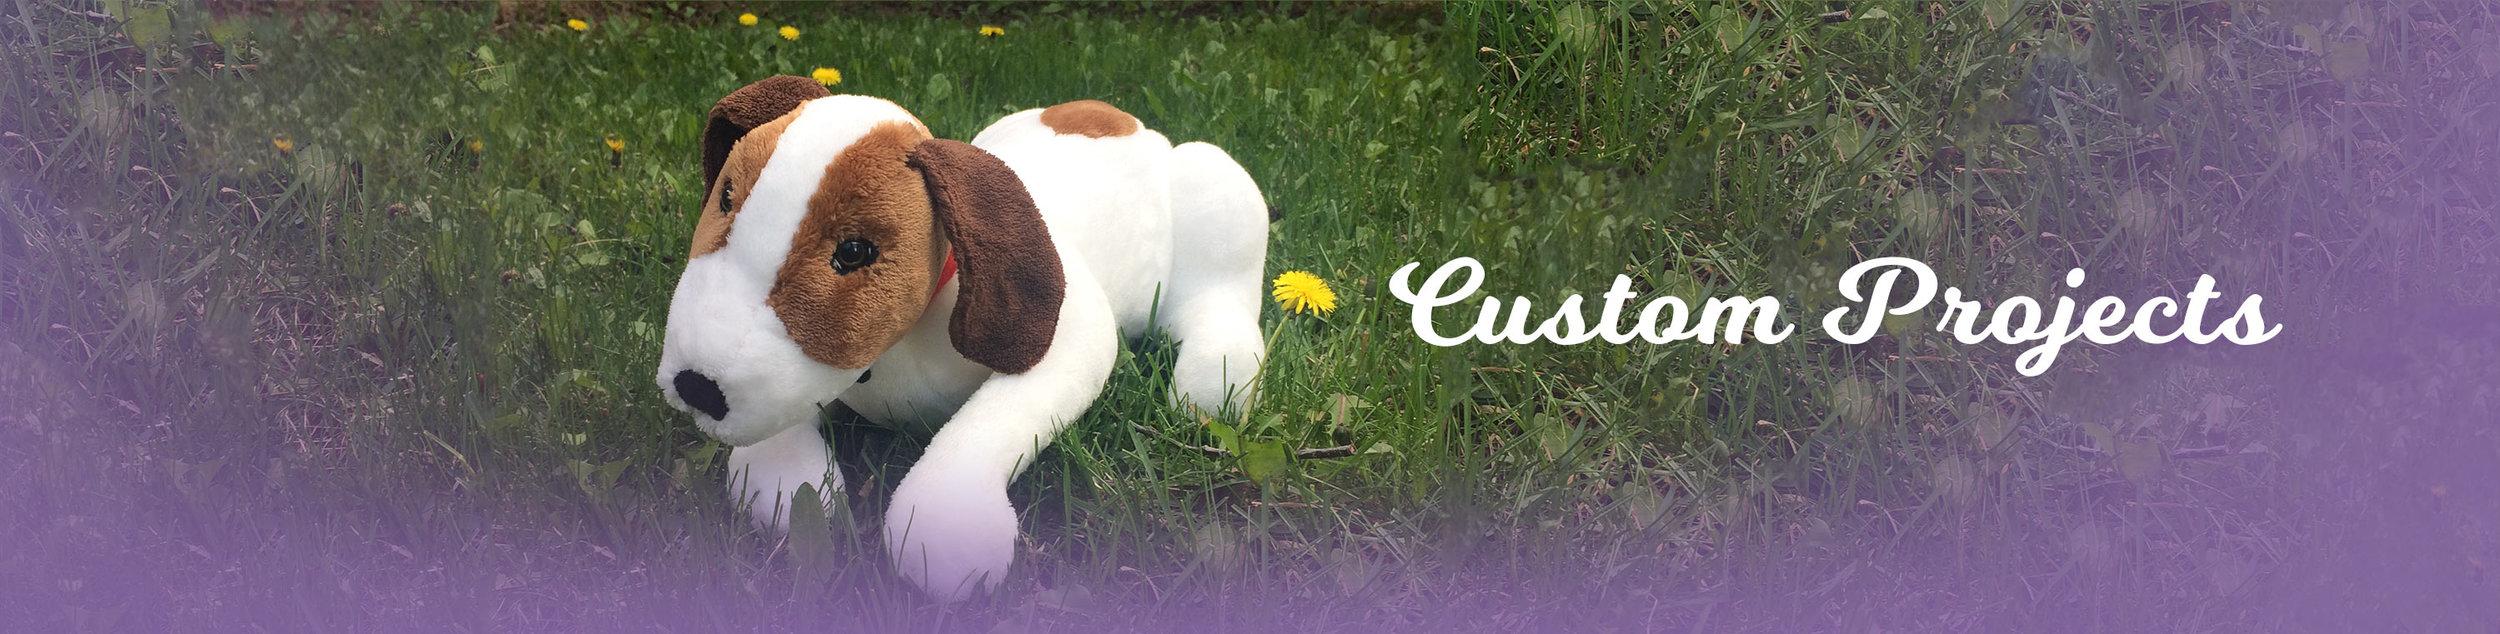 Dog Custom Projects BannerV2.jpg